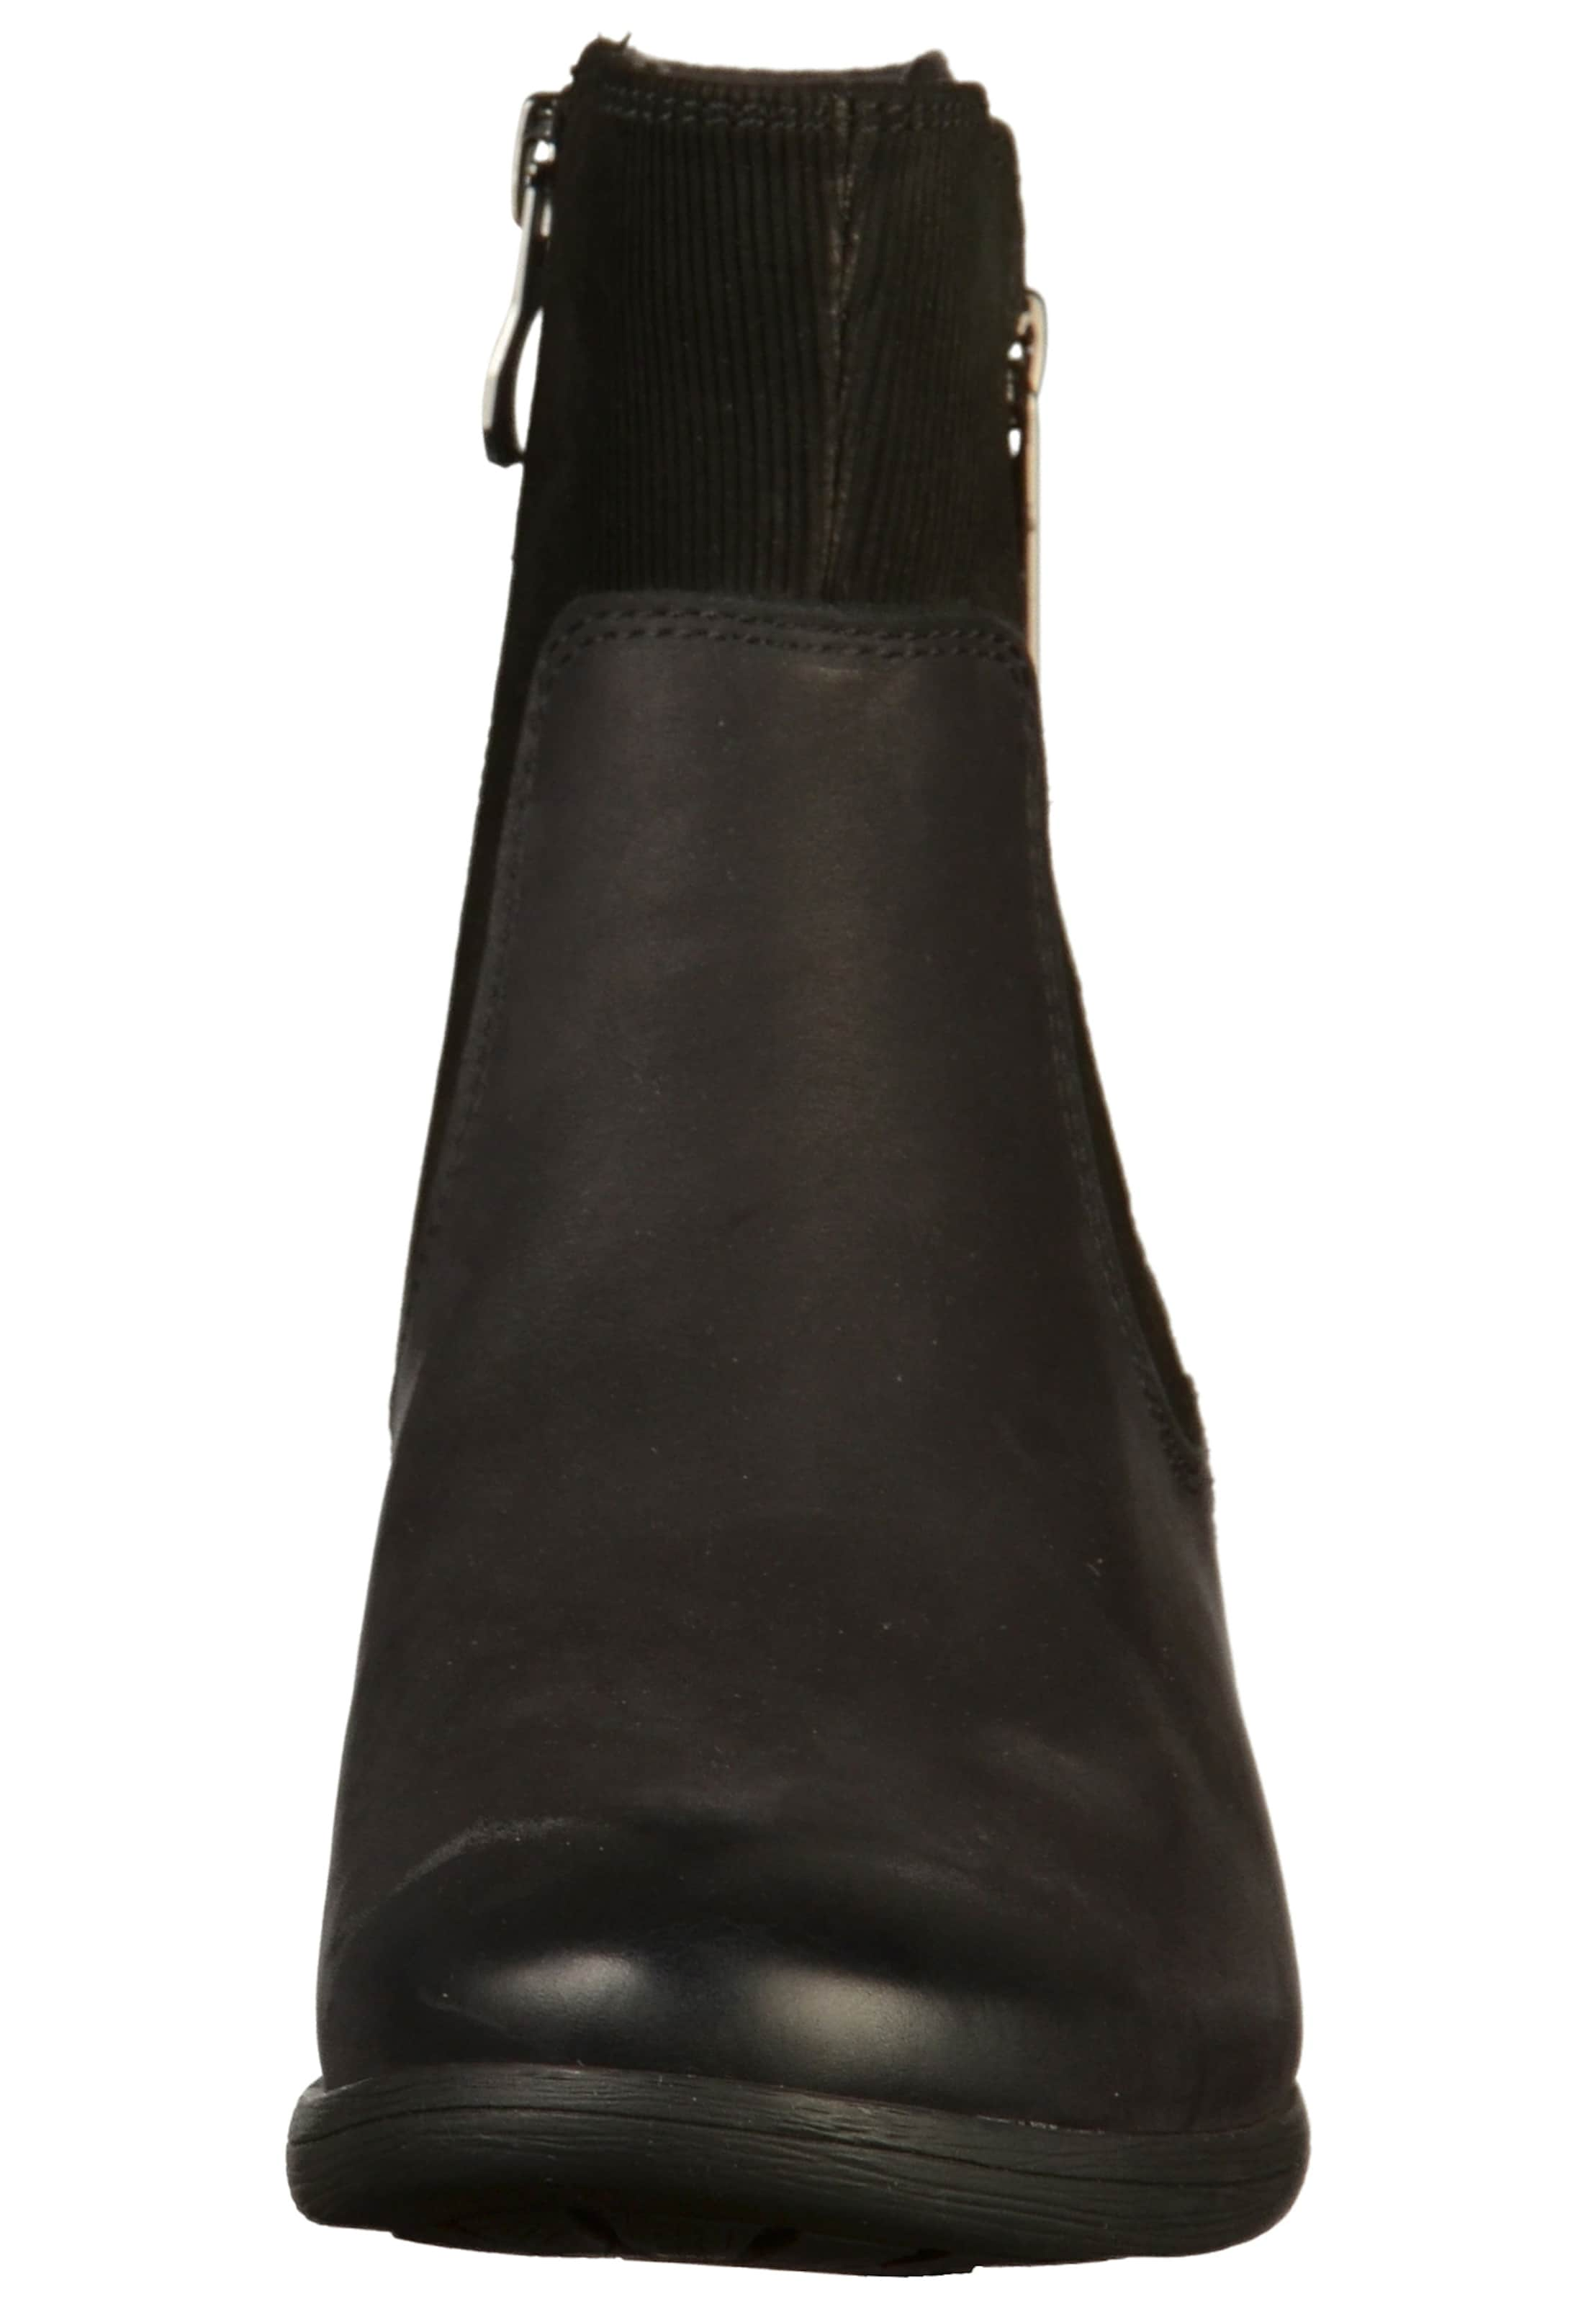 CAPRICE Stiefelette Leder, Textil Bequem, aussehend gut aussehend Bequem, ecb5e1